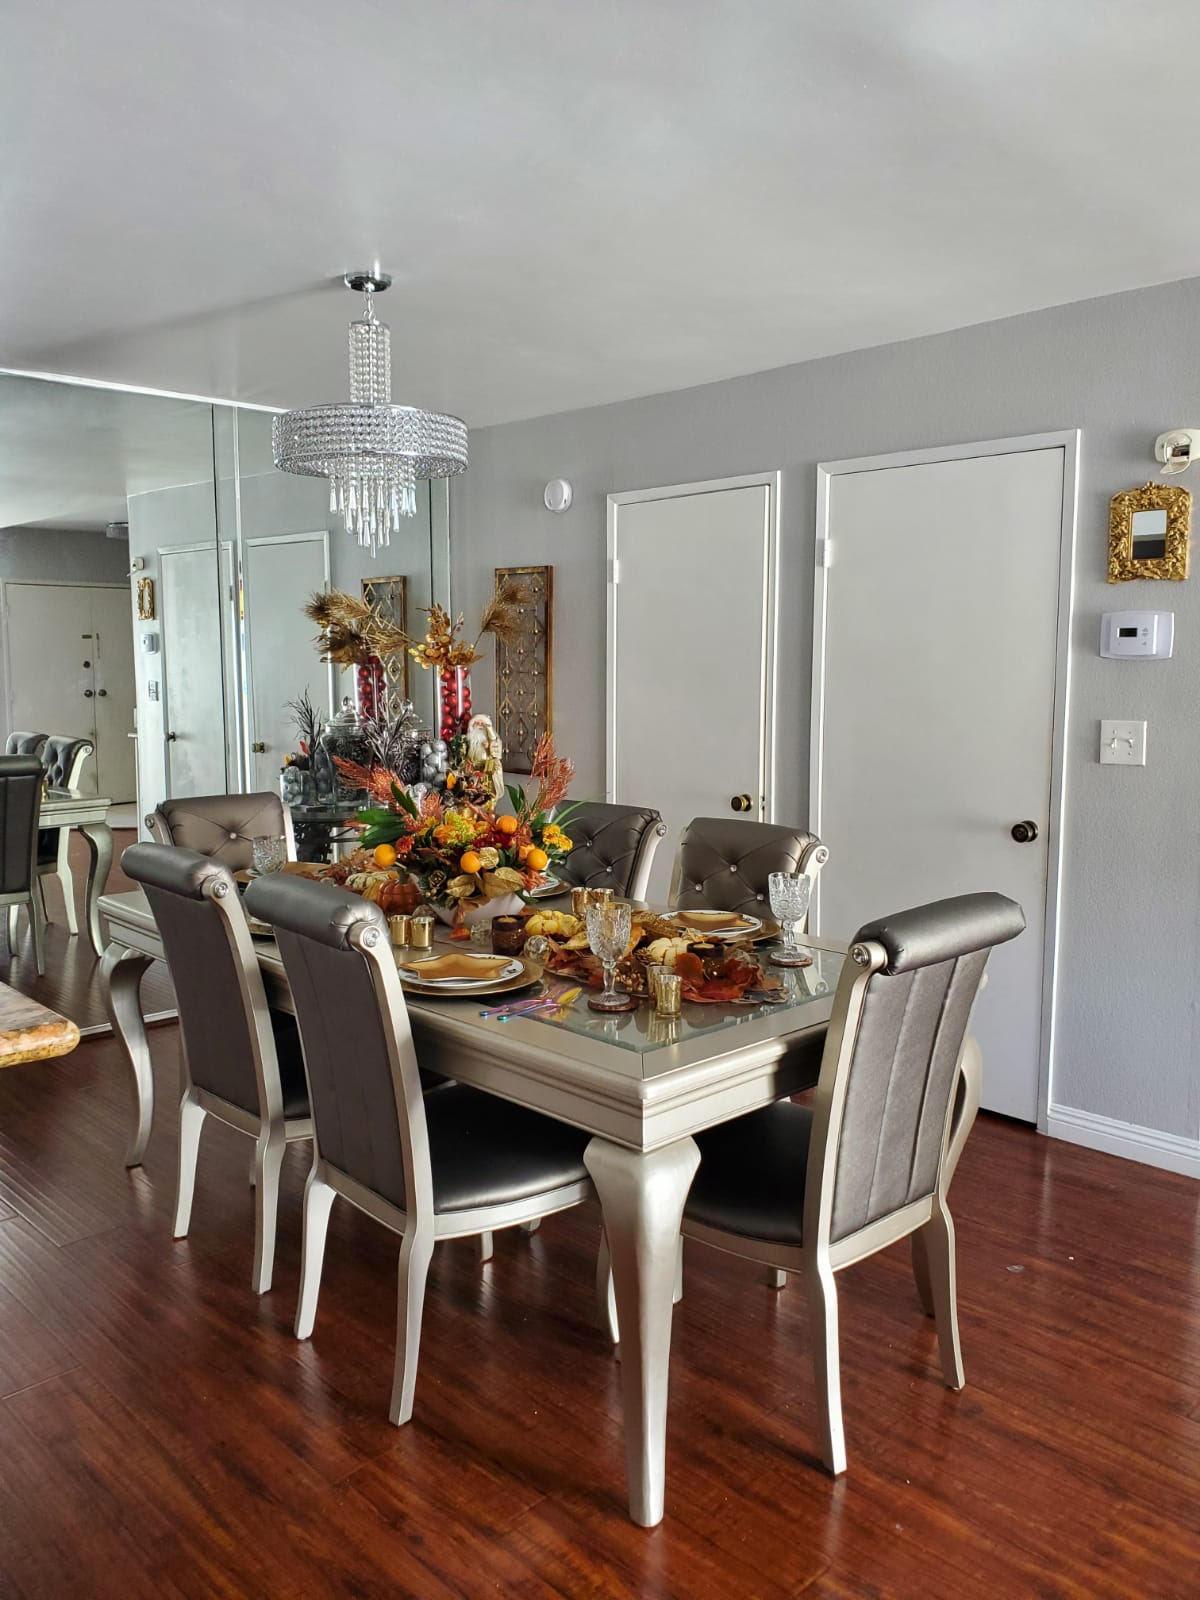 Property Image for 8341 De Soto Ave # 17